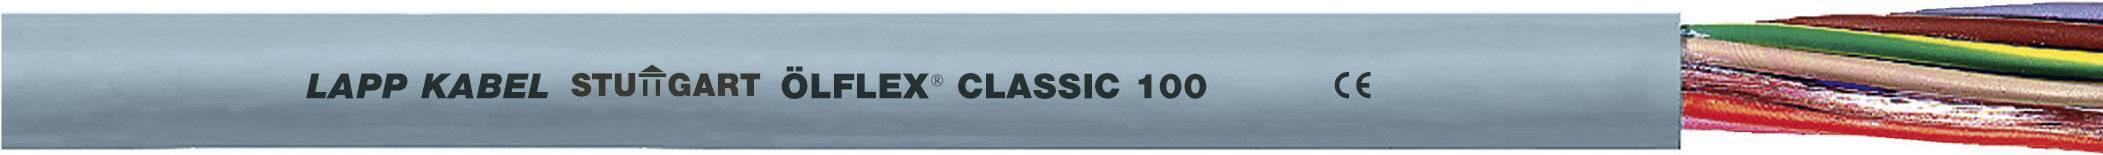 Kabel LappKabel Ölflex CLASSIC 100 3G10 (0010301), PVC, 15,9 mm, 750 V, šedá, 500 m